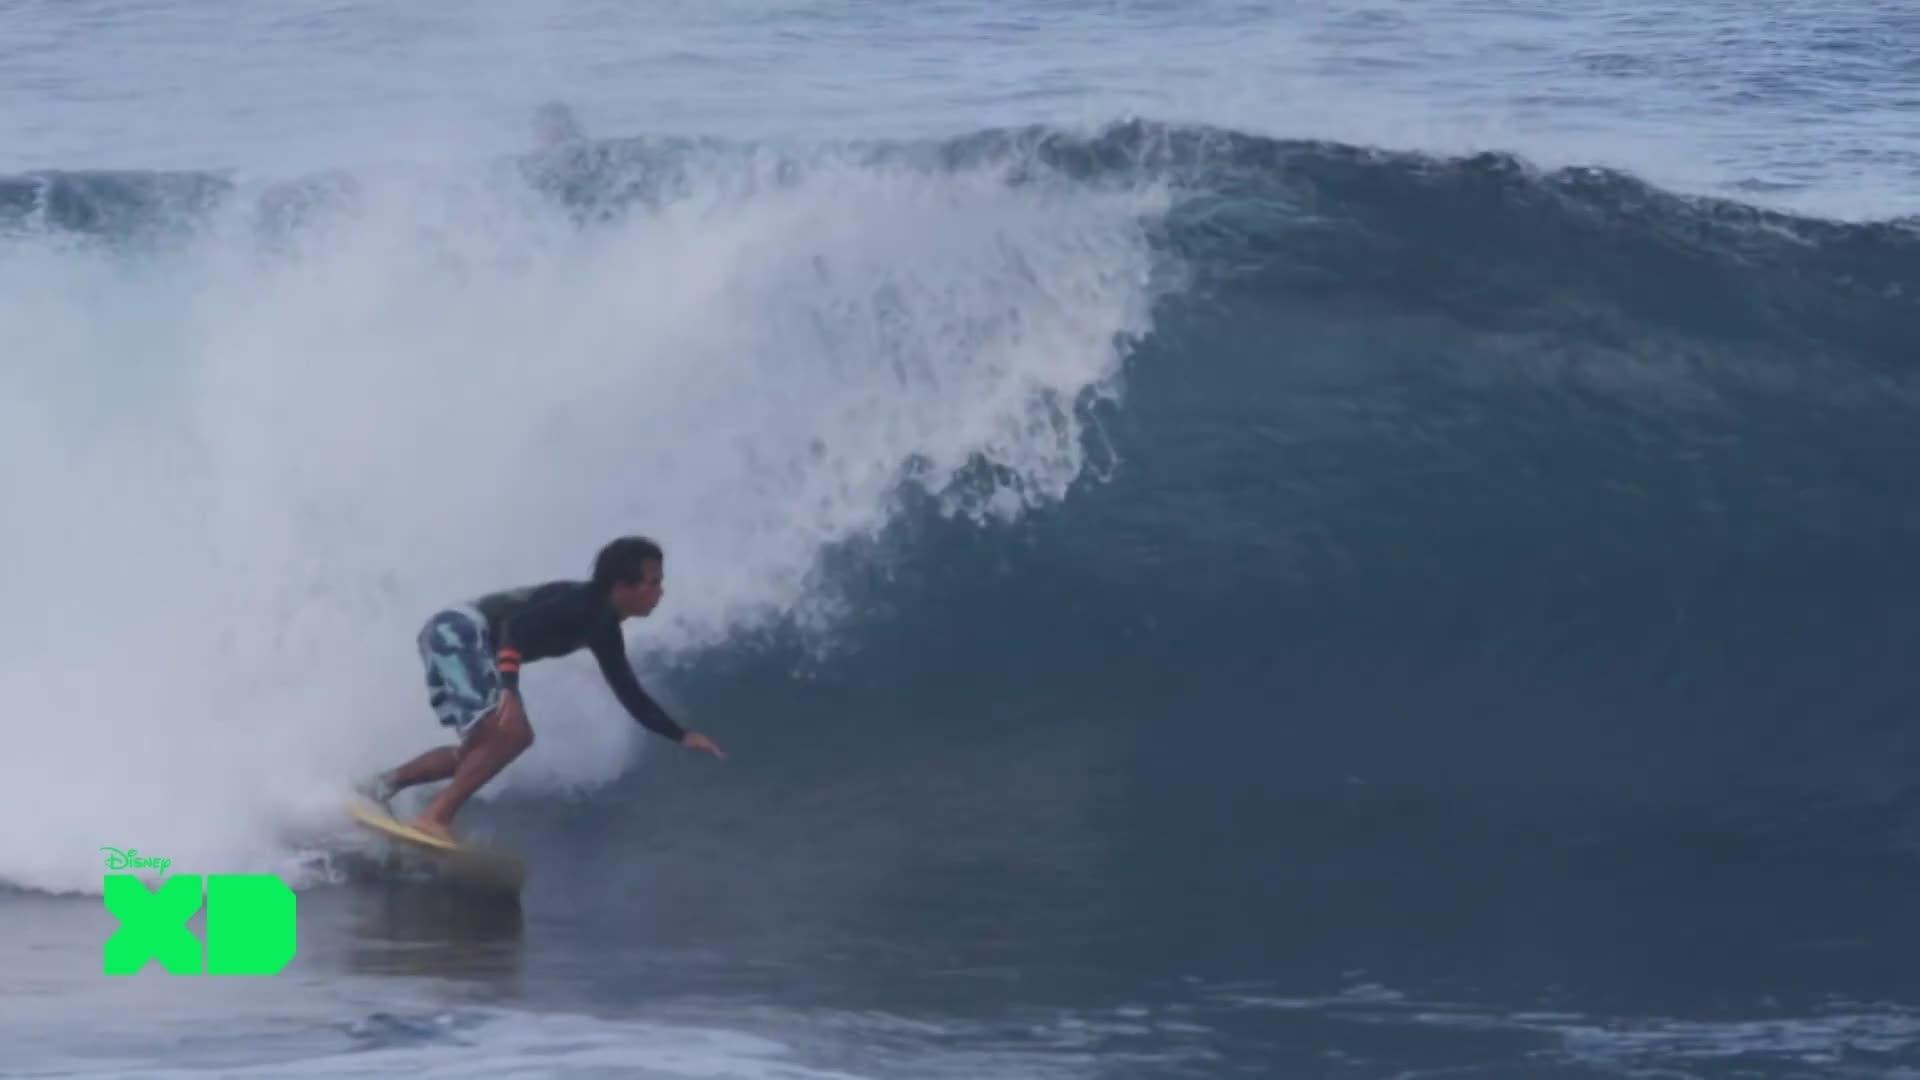 Disney XD Sport News - Windsurf : Naish / Lenny